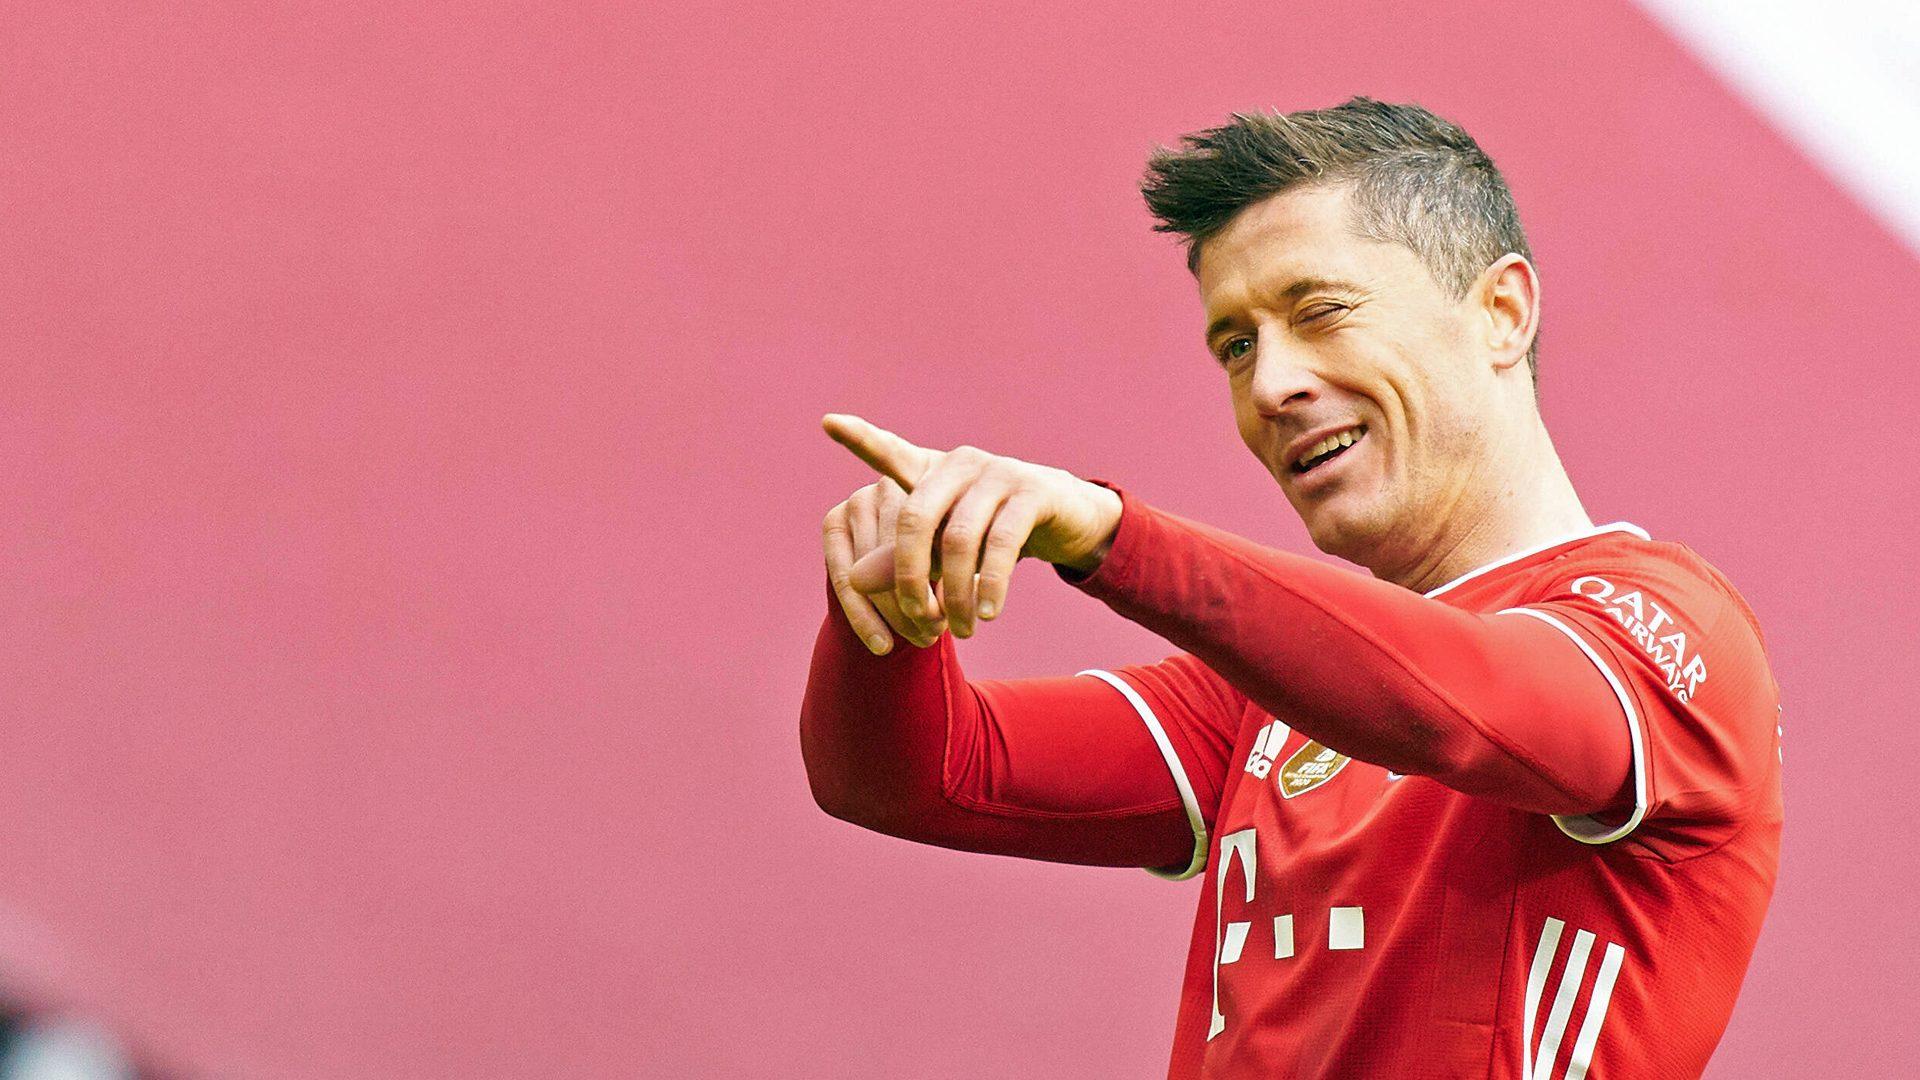 Bundesliga | Bayern Munich's Robert Lewandowski eyeing scoring record on  return